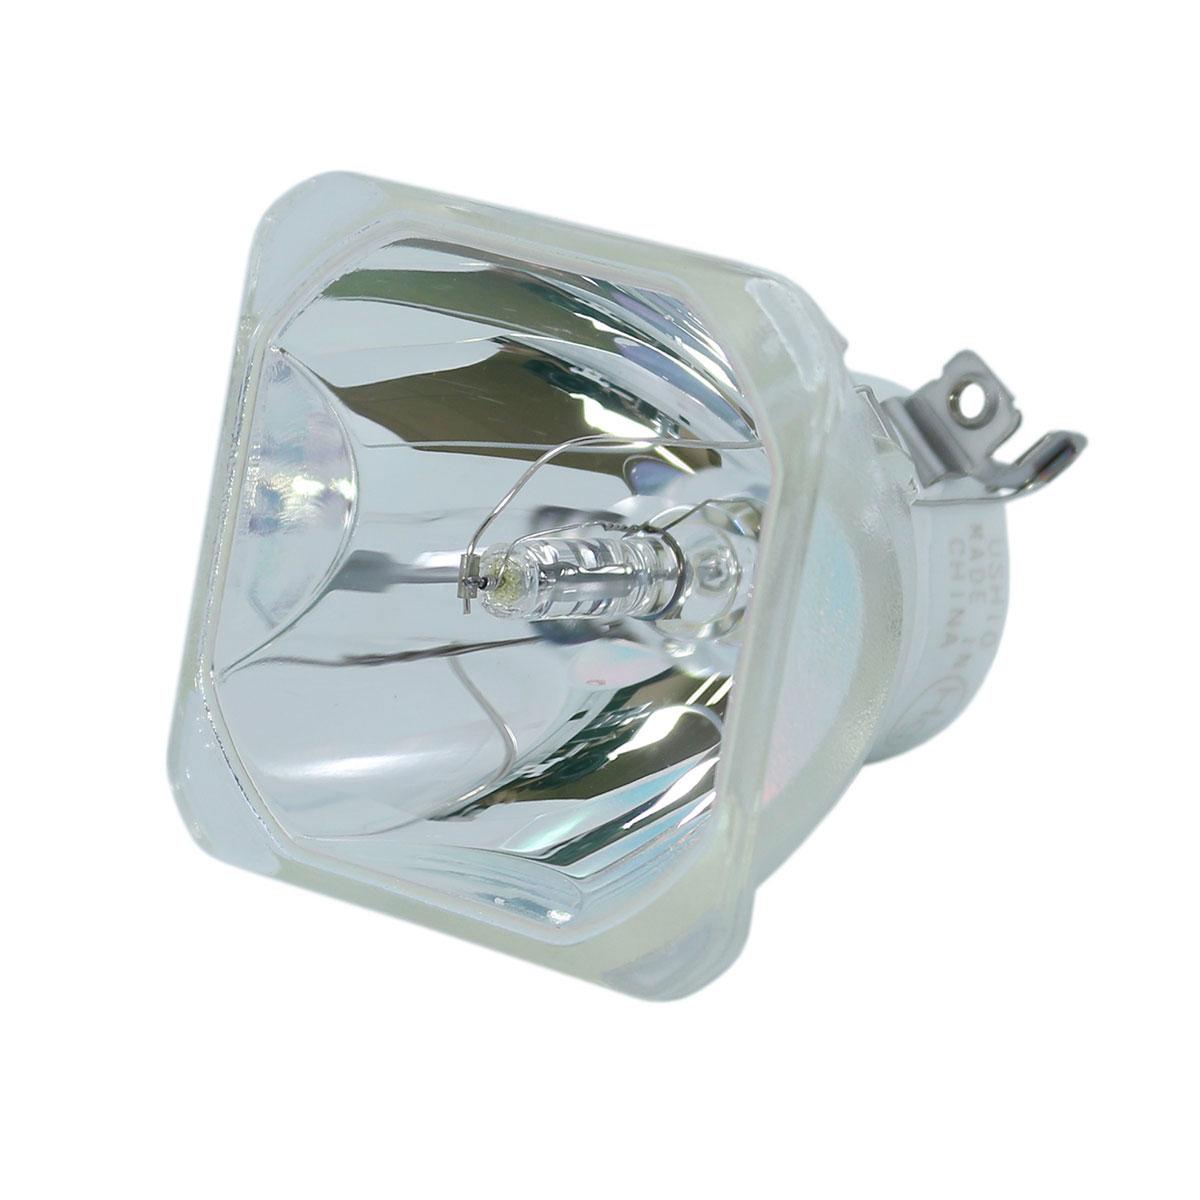 Ushio Original Bare Lamp For Panasonic PT-LB300U / PTLB300U Projector DLP LCD